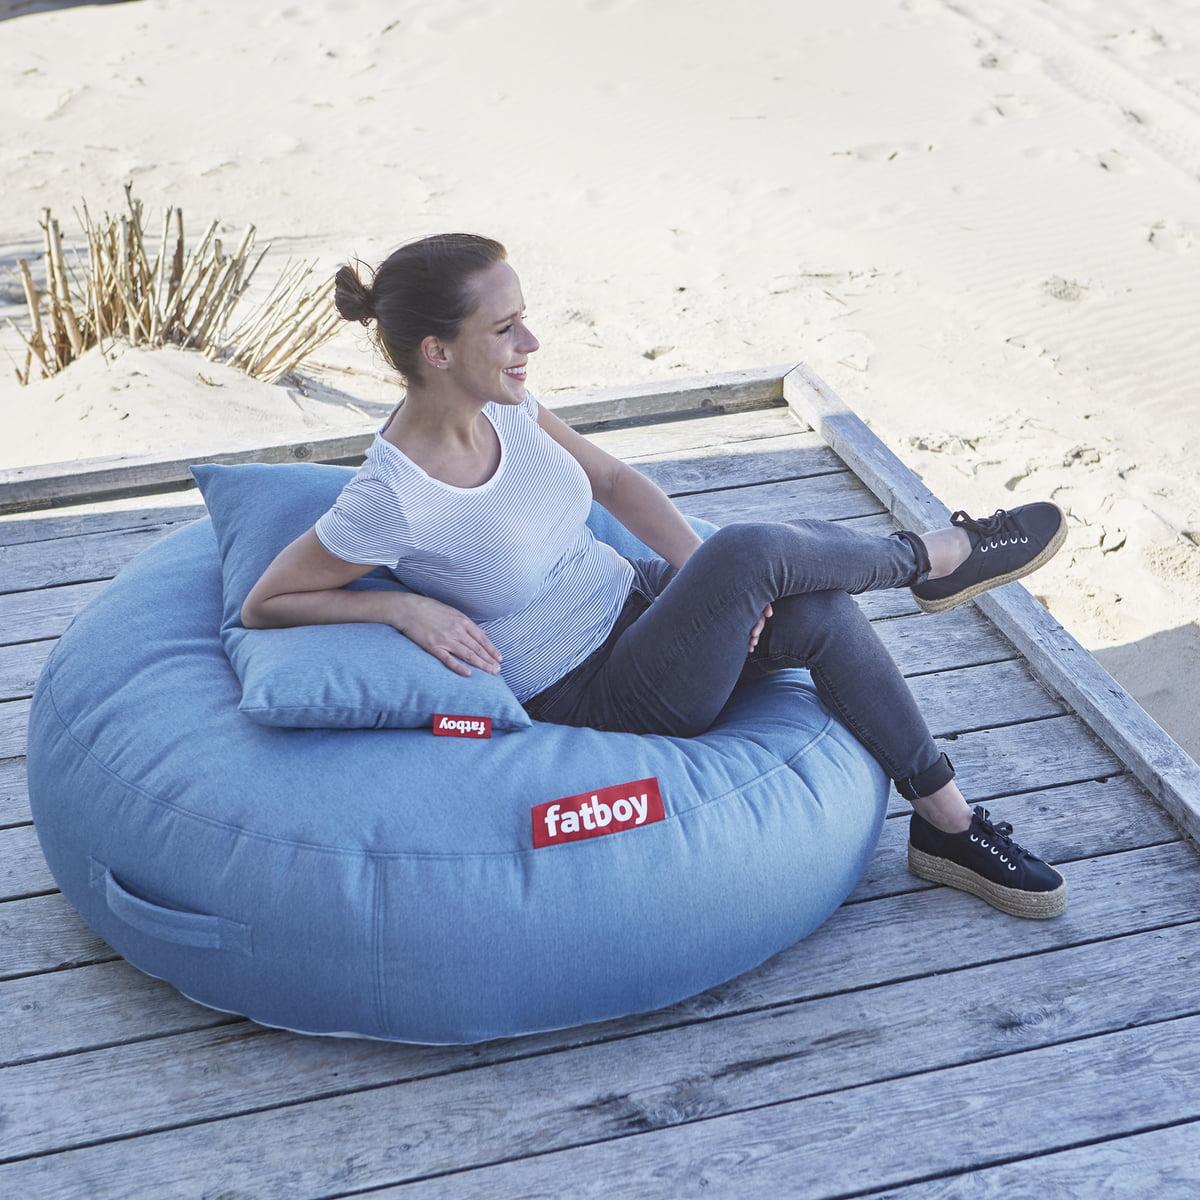 kissen f r pupillow outdoor sitzsack von fatboy connox. Black Bedroom Furniture Sets. Home Design Ideas